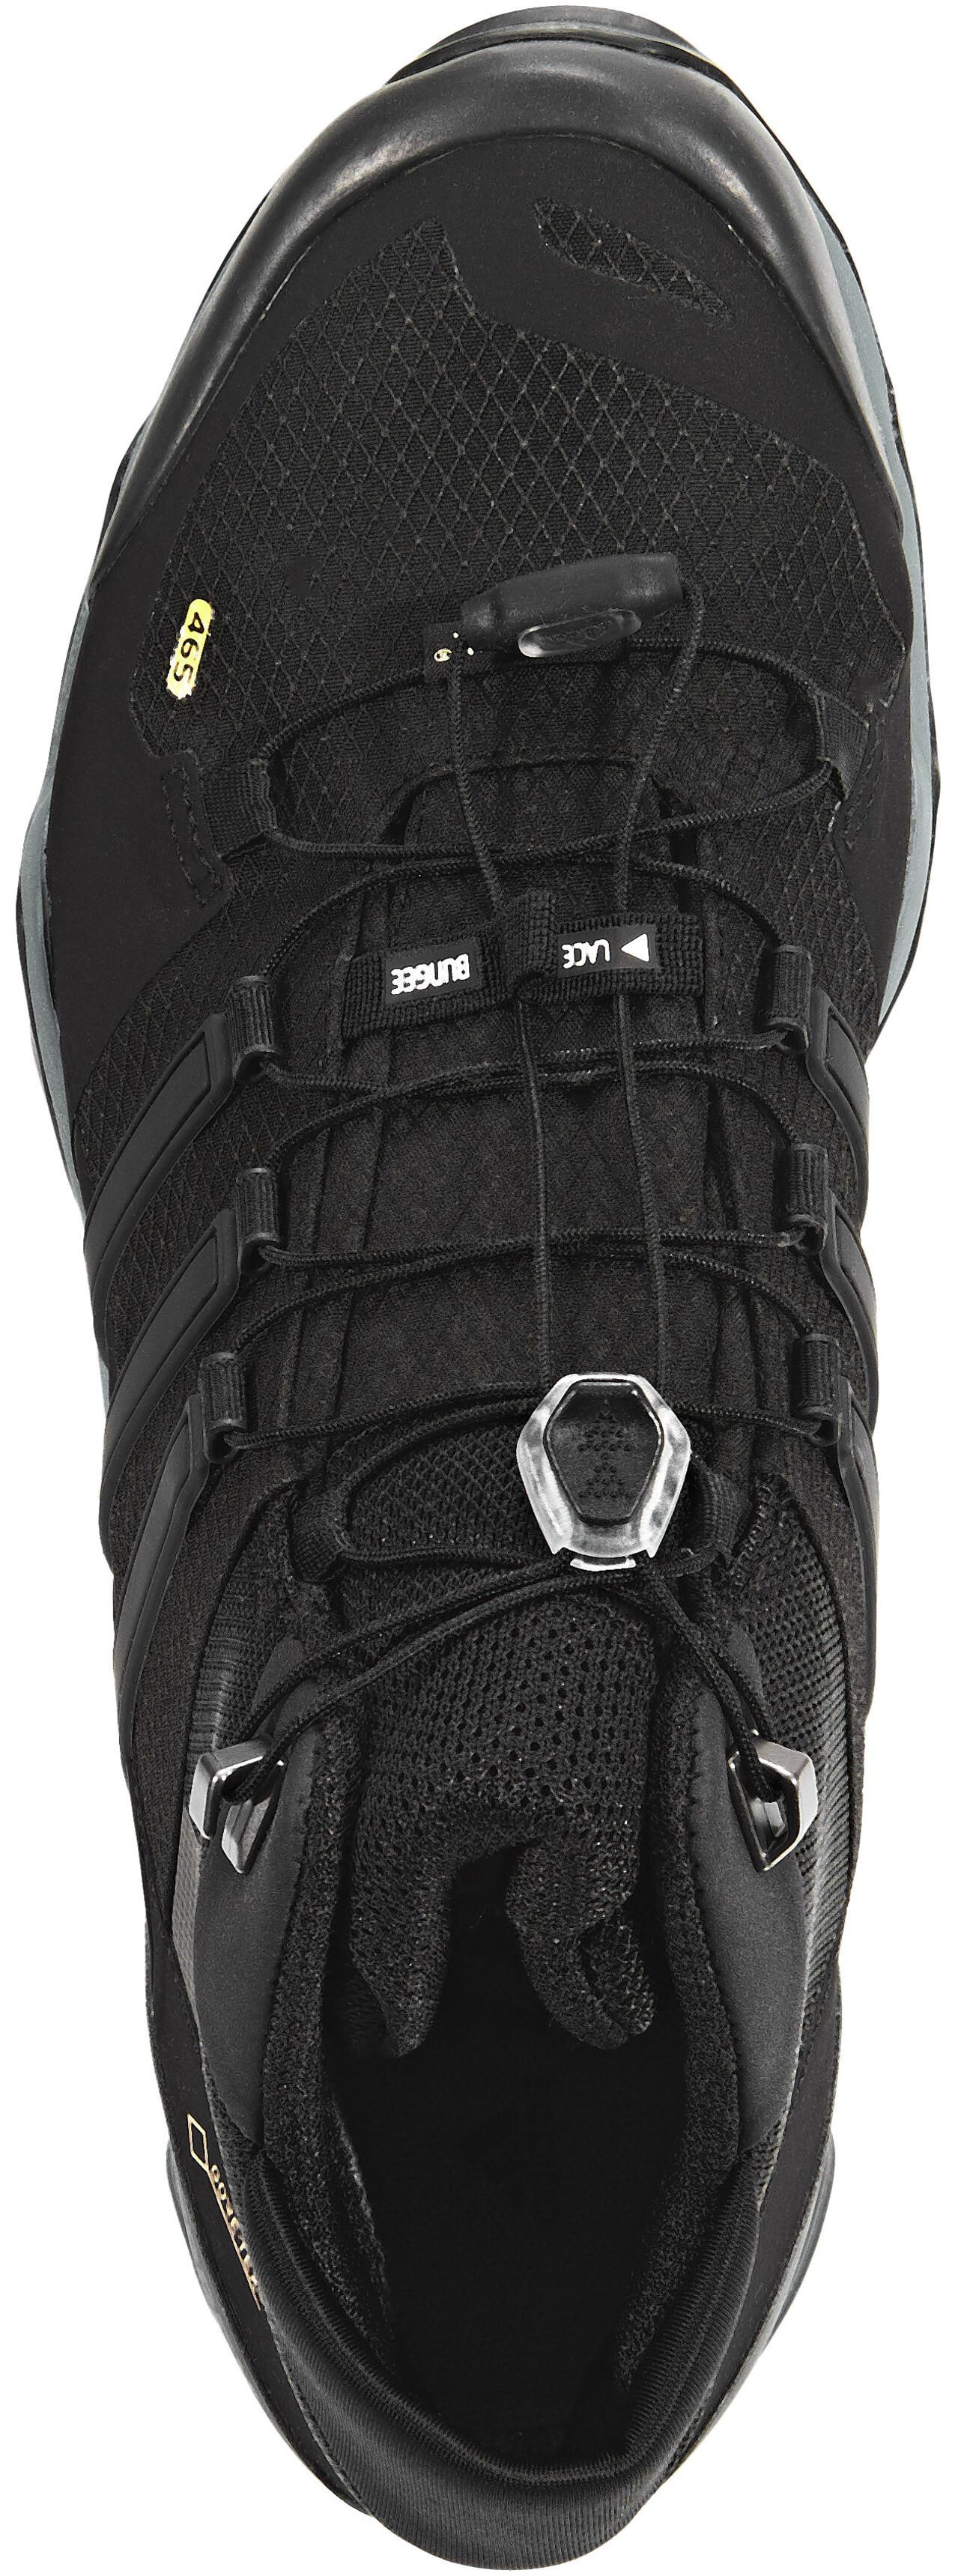 adidas terrex fast r mid gtx shoes men core black core. Black Bedroom Furniture Sets. Home Design Ideas